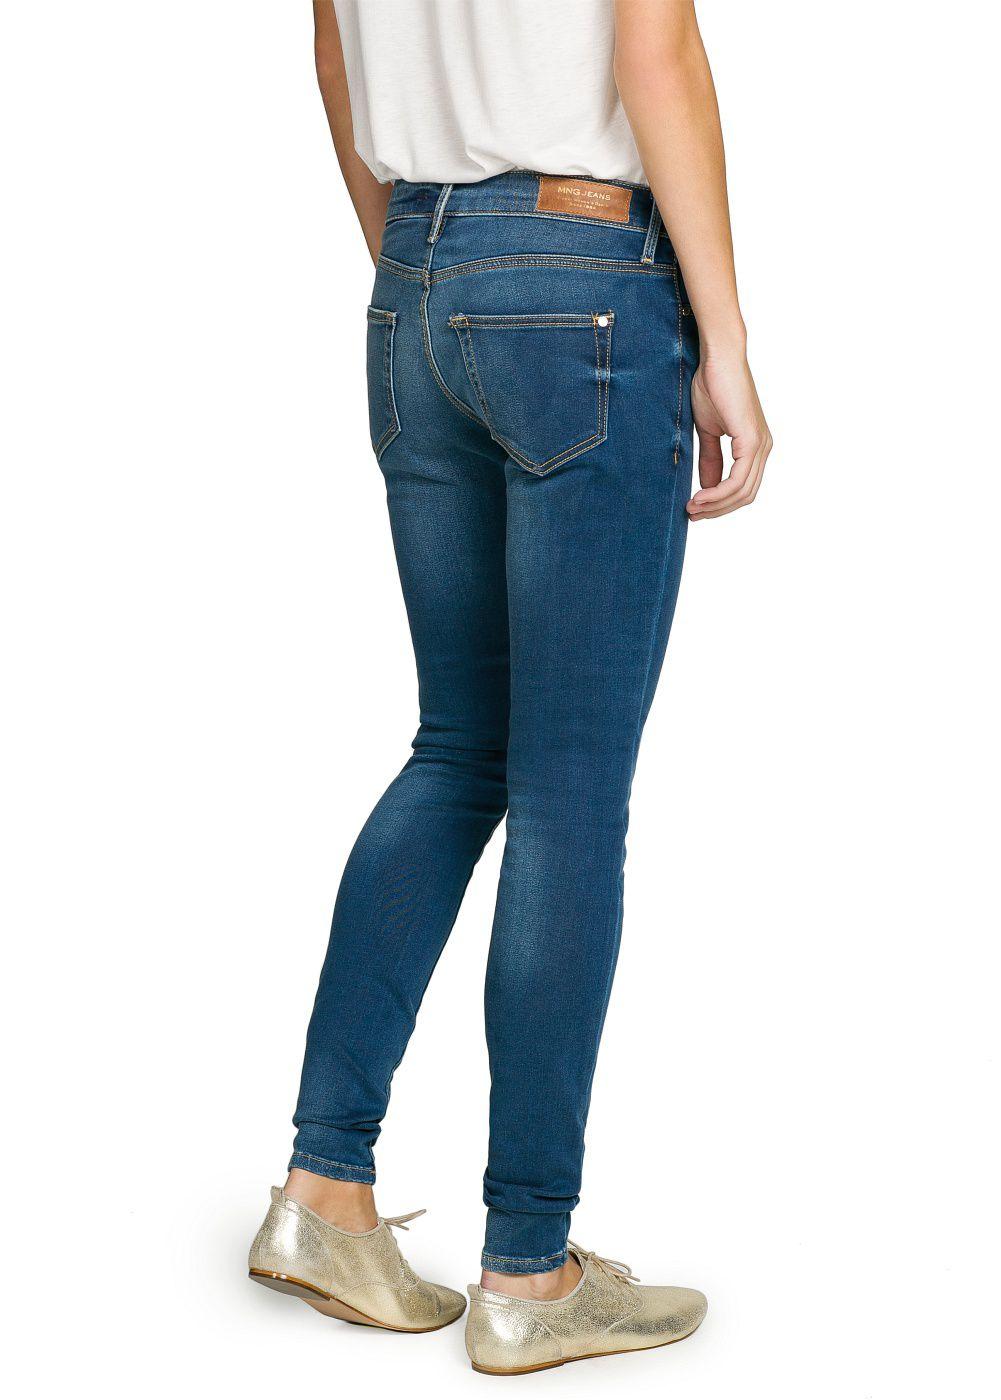 Mango Super Slimfit Elektra Jeans in Blue